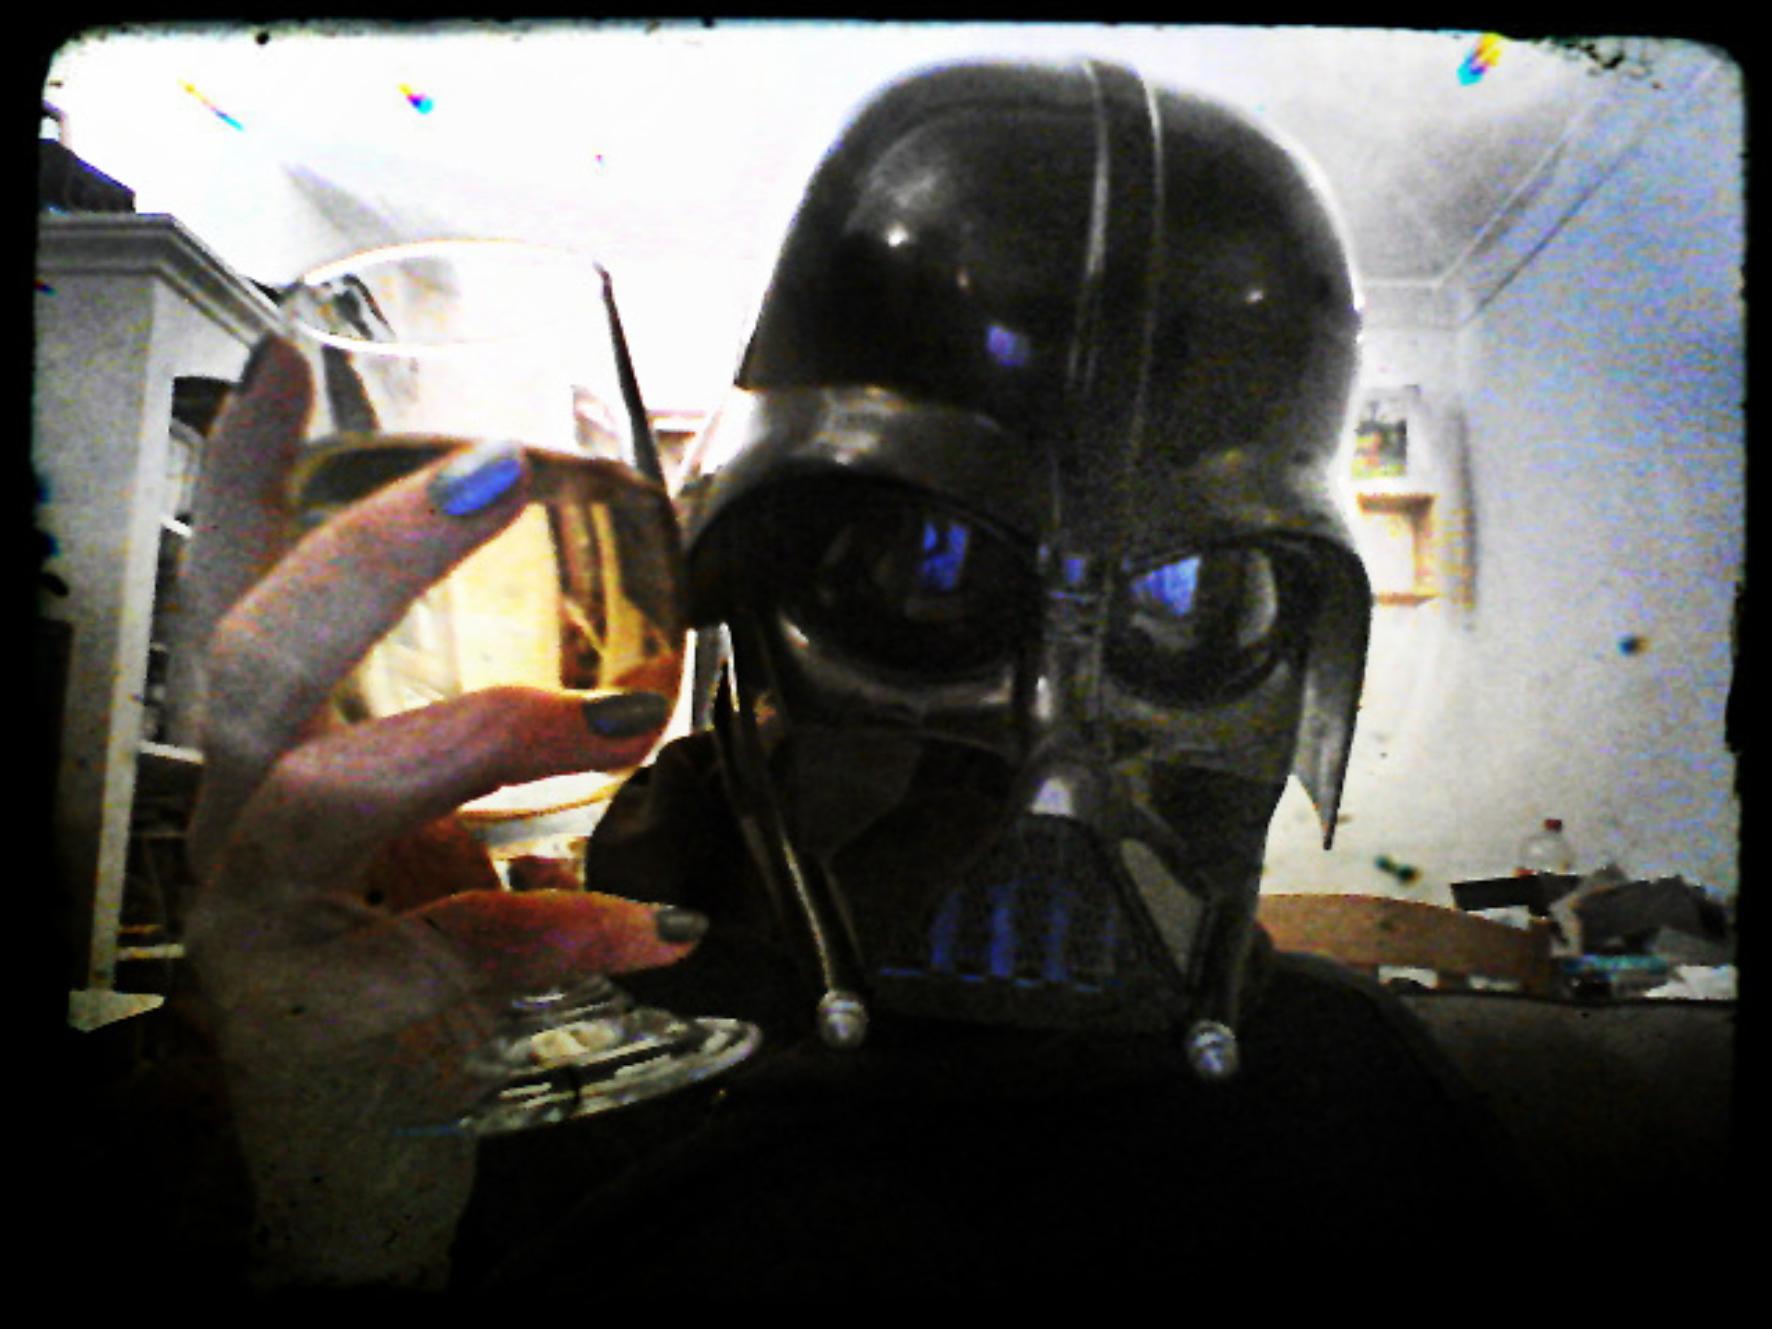 Liz Sterry 5 - Drinking whiskey as Darth Vader